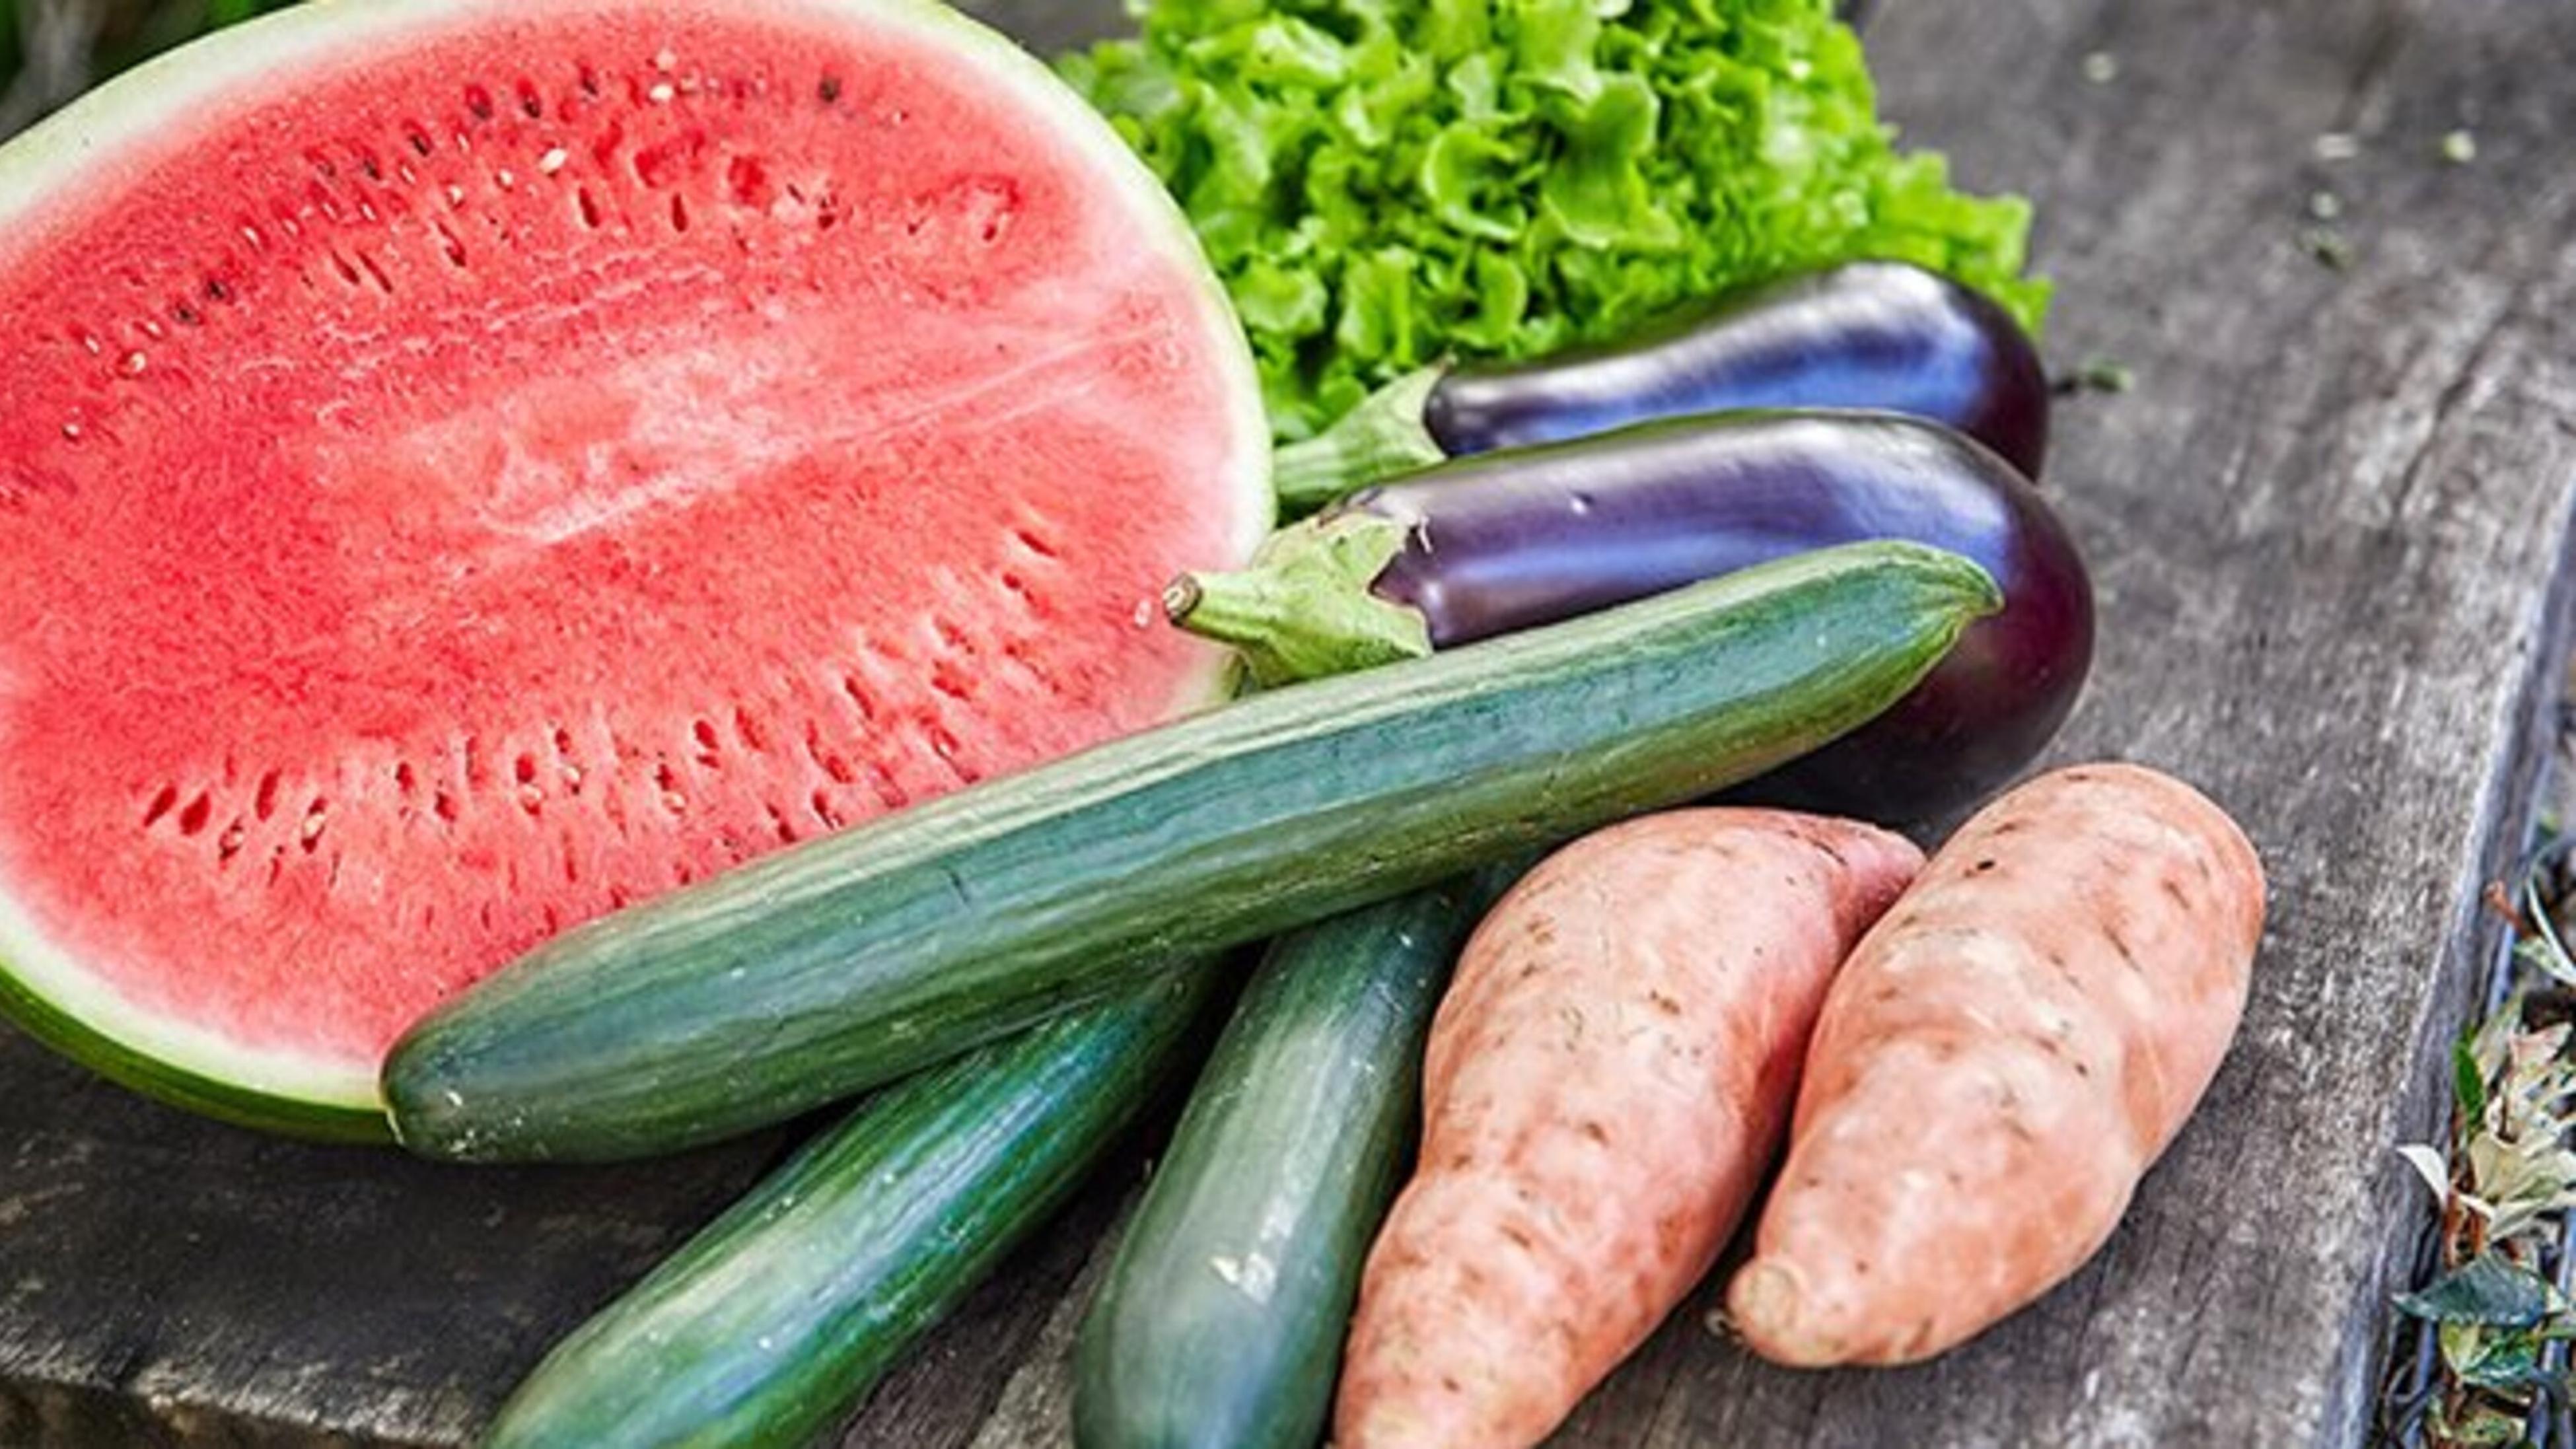 Watermelong, cucumbers, sweet potatoes and eggplants